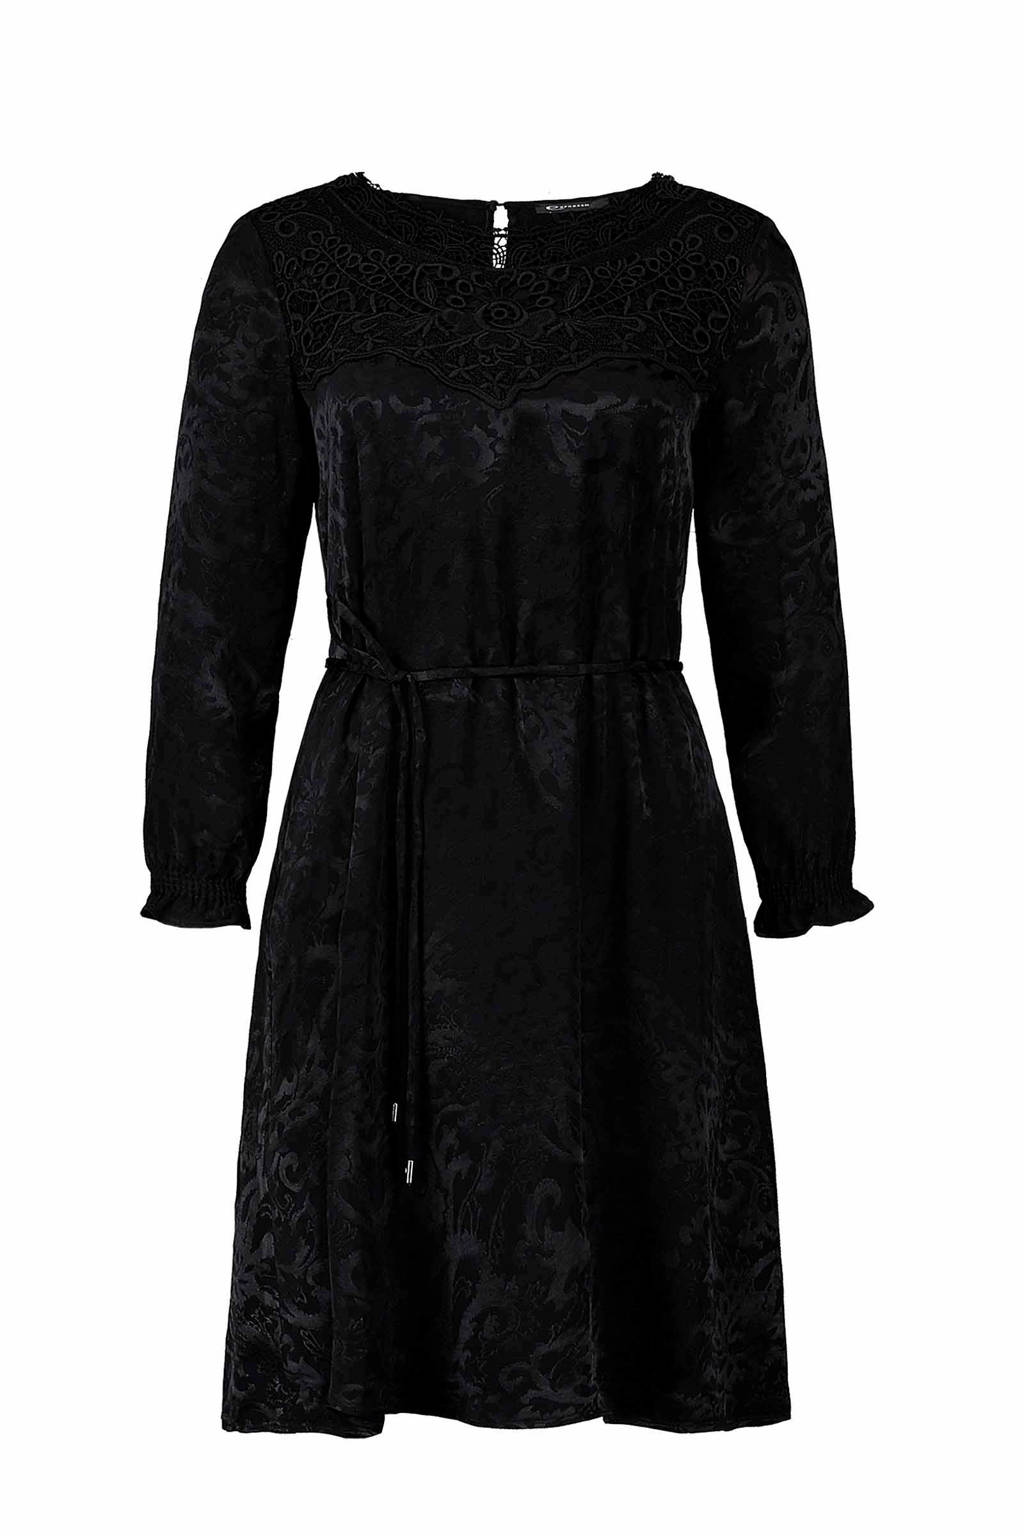 f1ceec4ff8d Expresso jacquard jurk met kant zwart | wehkamp